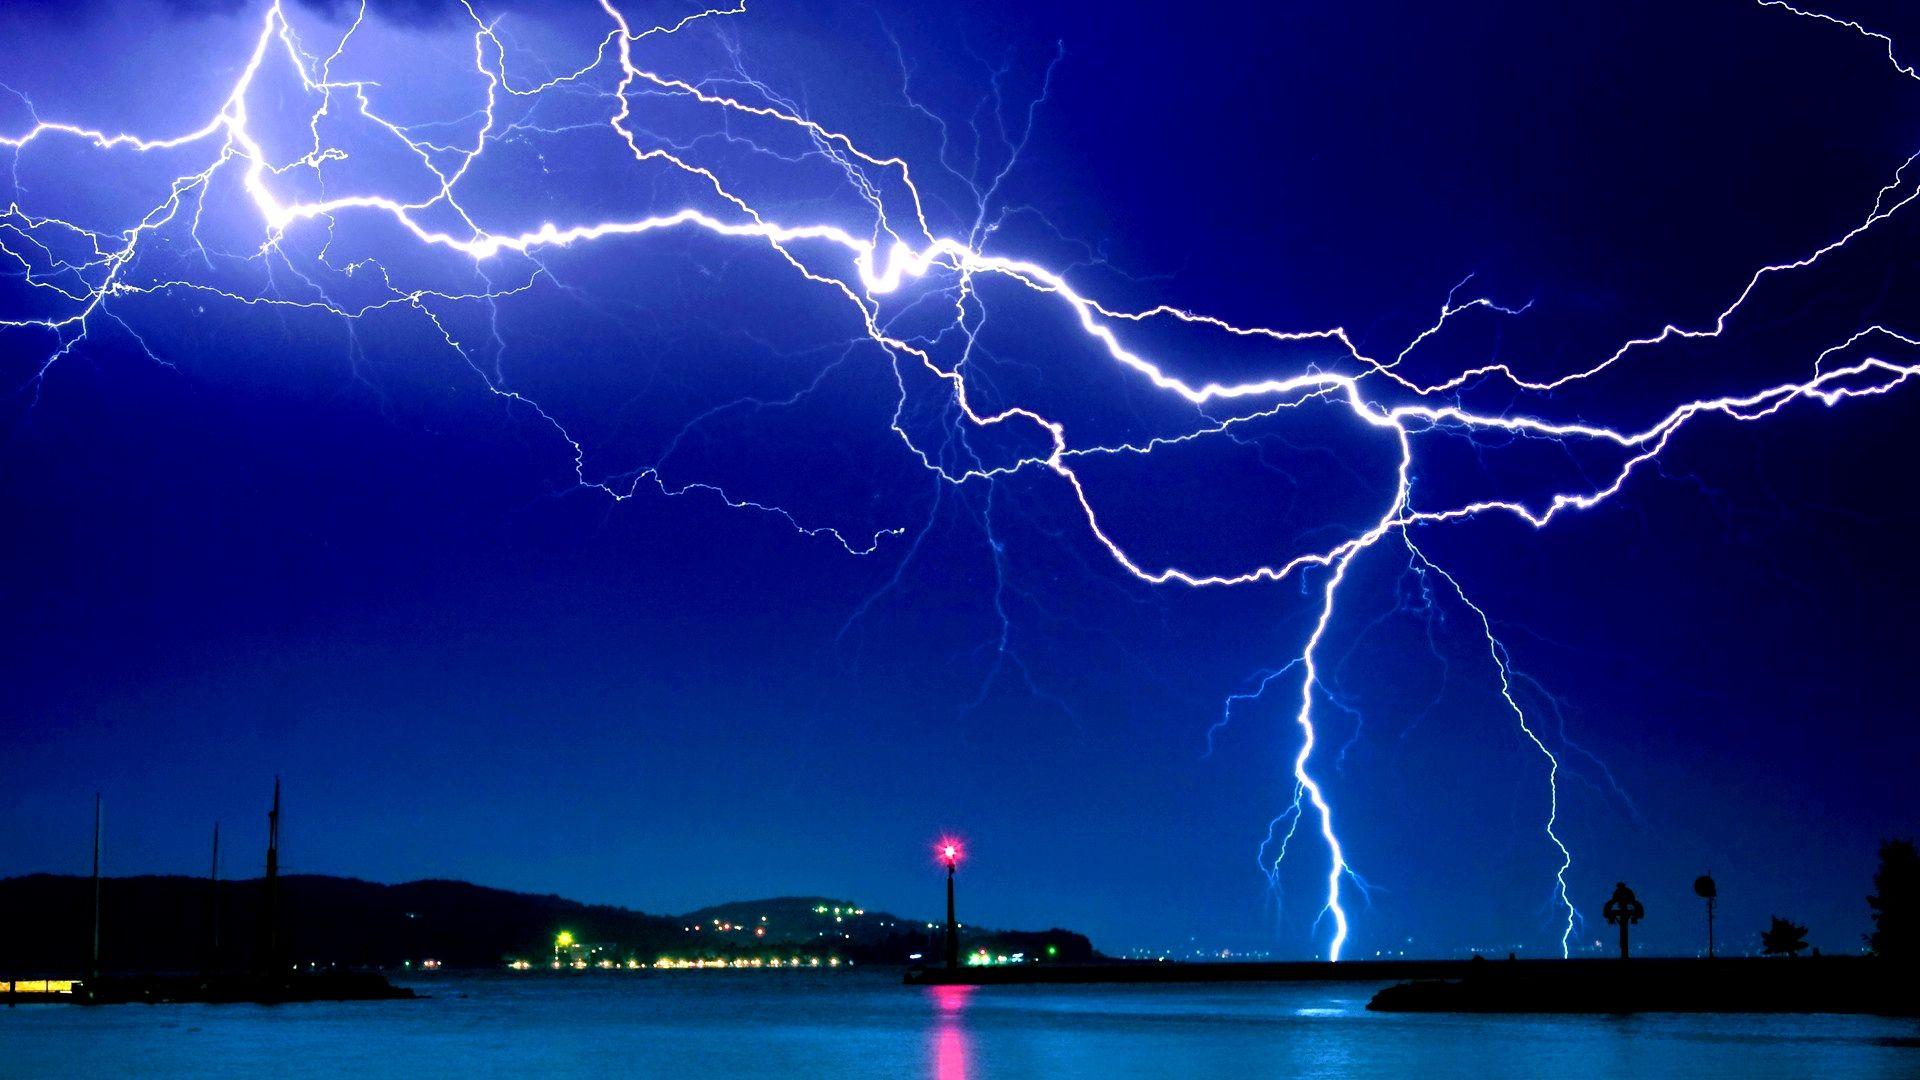 Amazing Lightning Wallpaper for Desktop Lightning